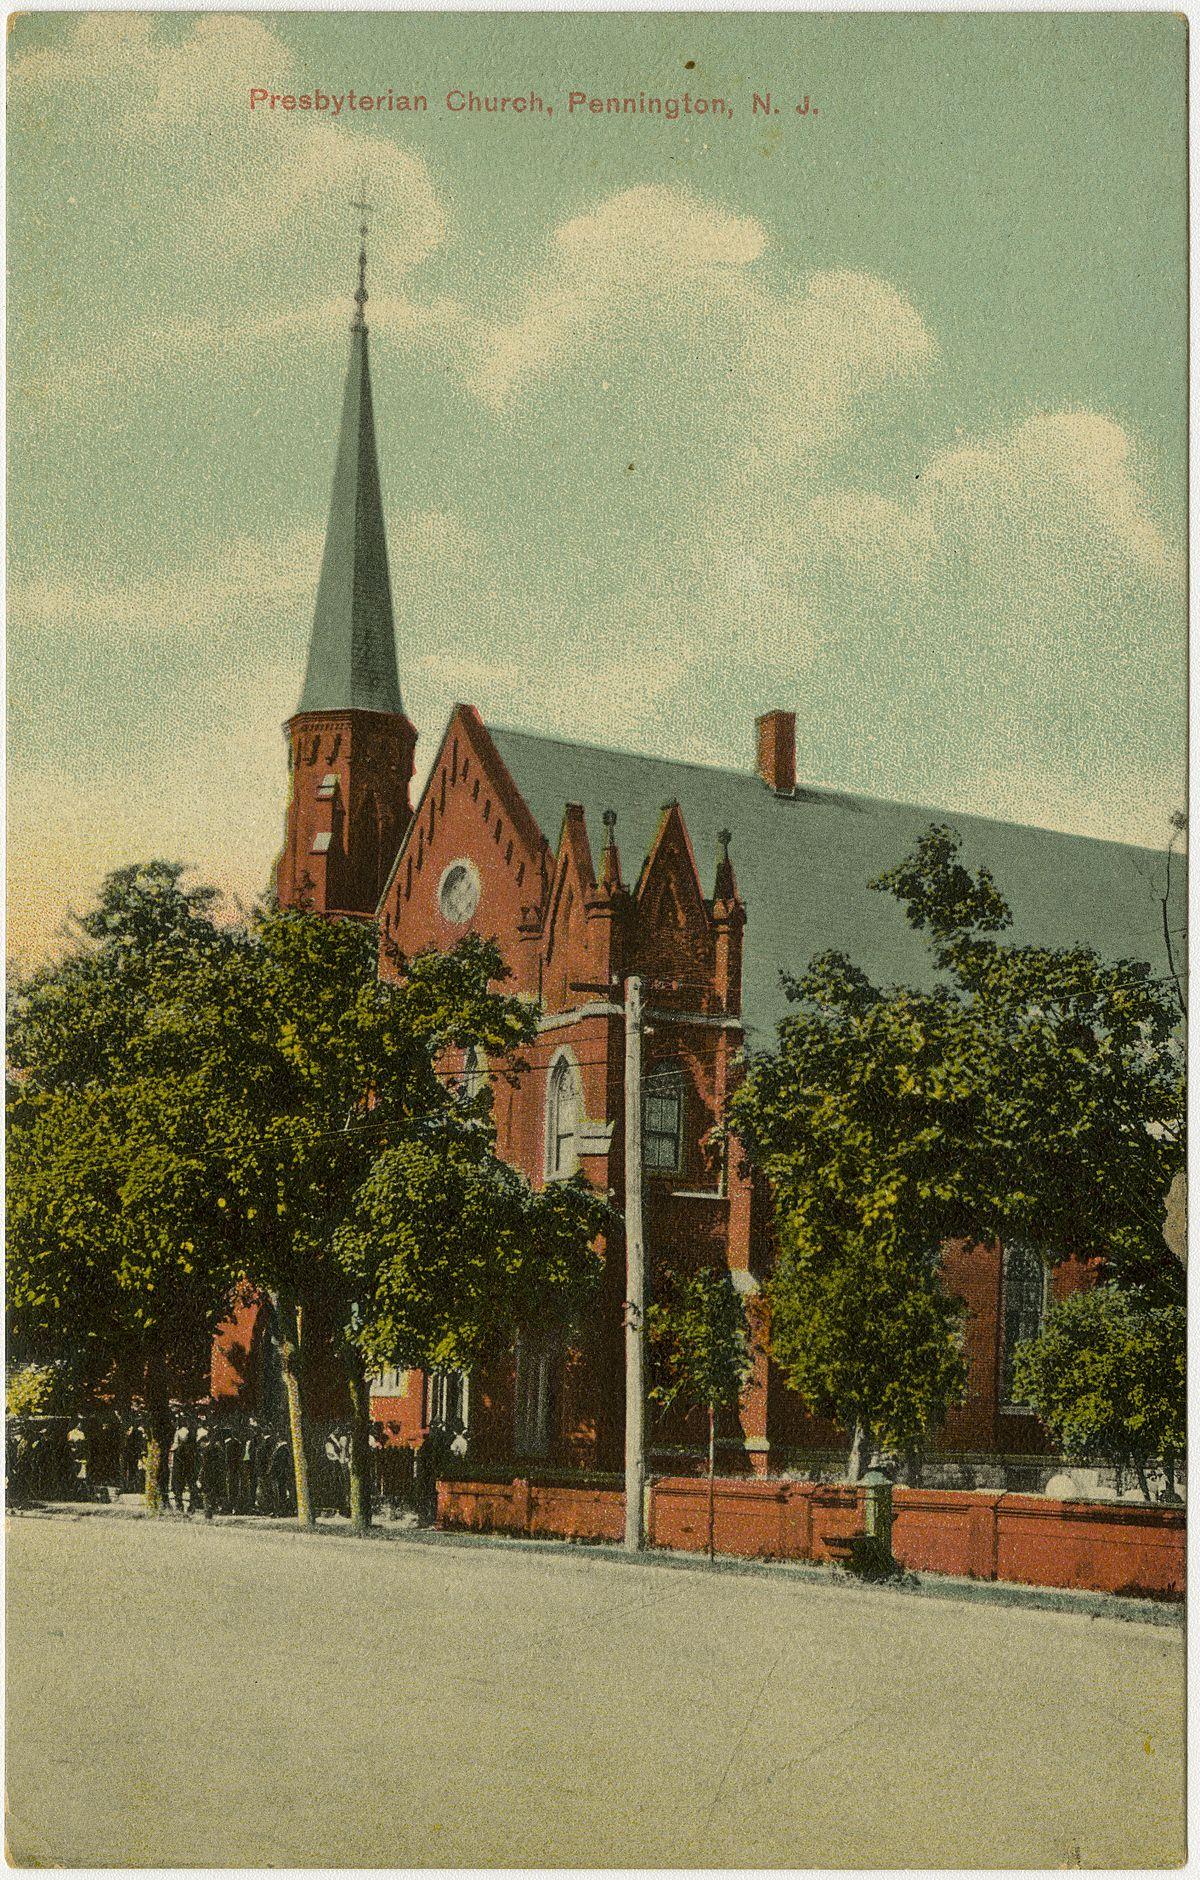 First Presbyterian Church (Pennington, New Jersey) - Wikipedia